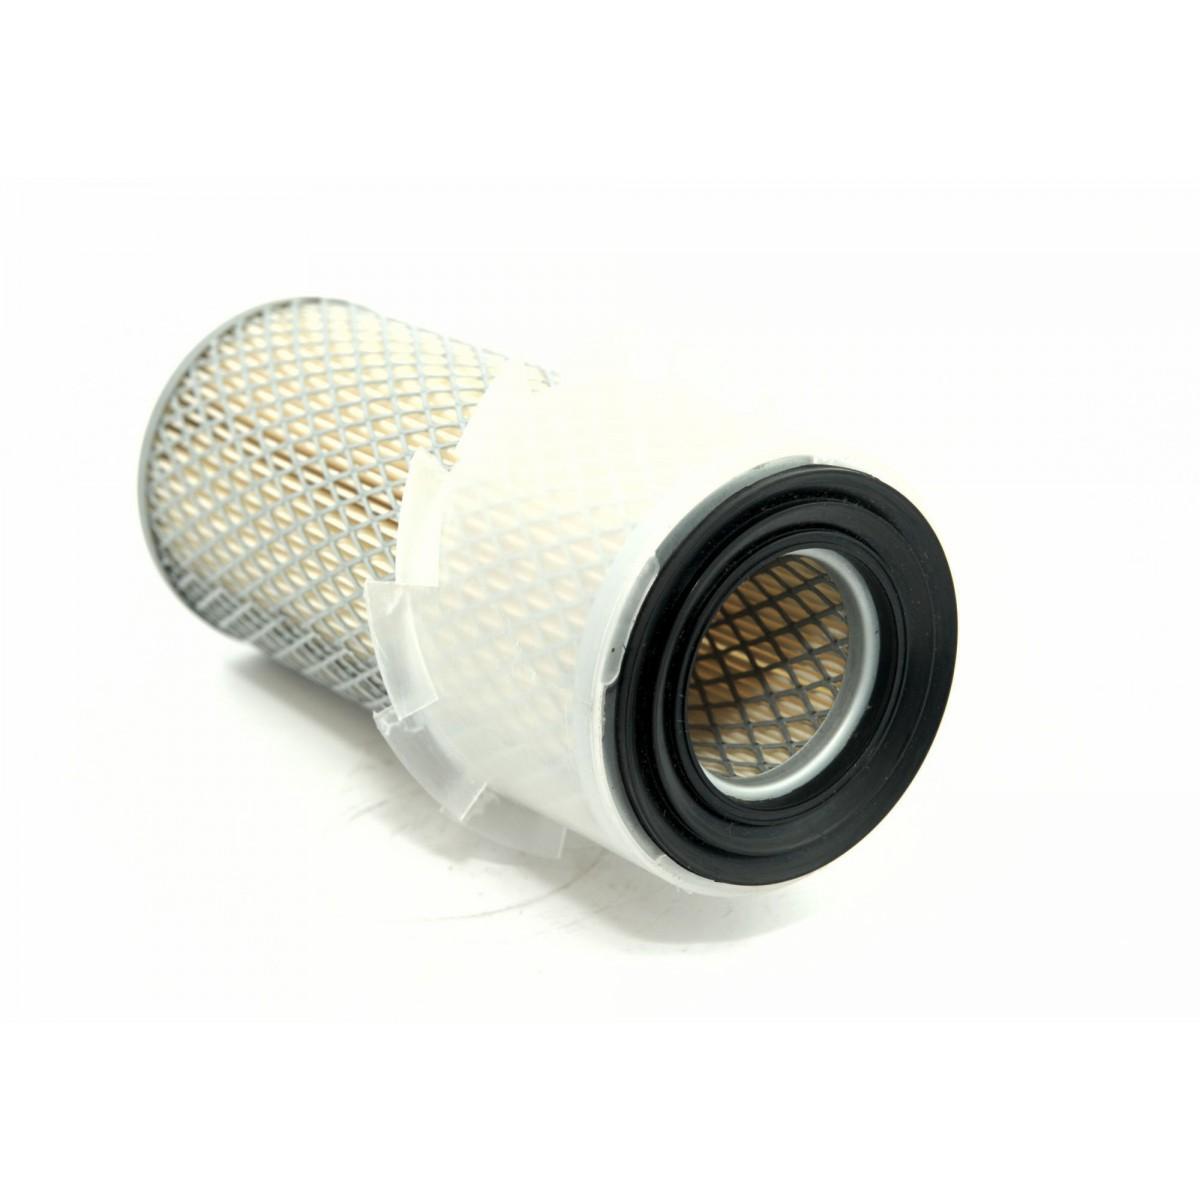 Air Filter Small Kubota L1500, L2000, Bulltra, Hinomoto, Yanmar 44x83x183